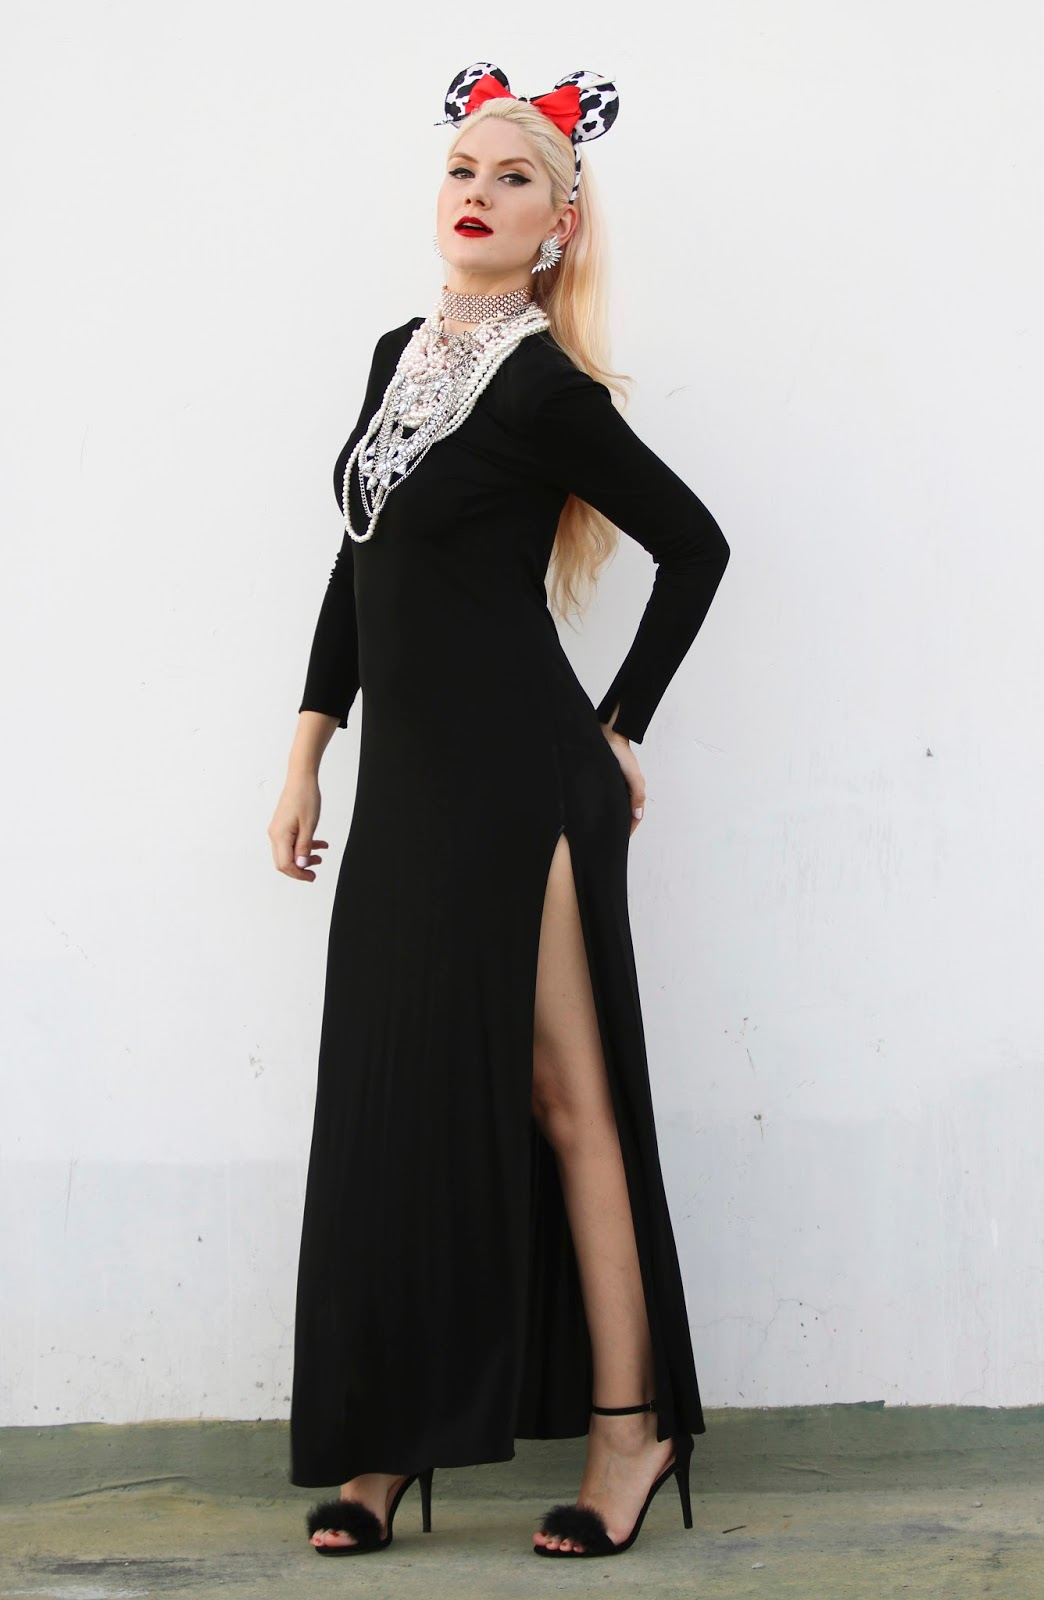 Cruella De Vil inspired outfit